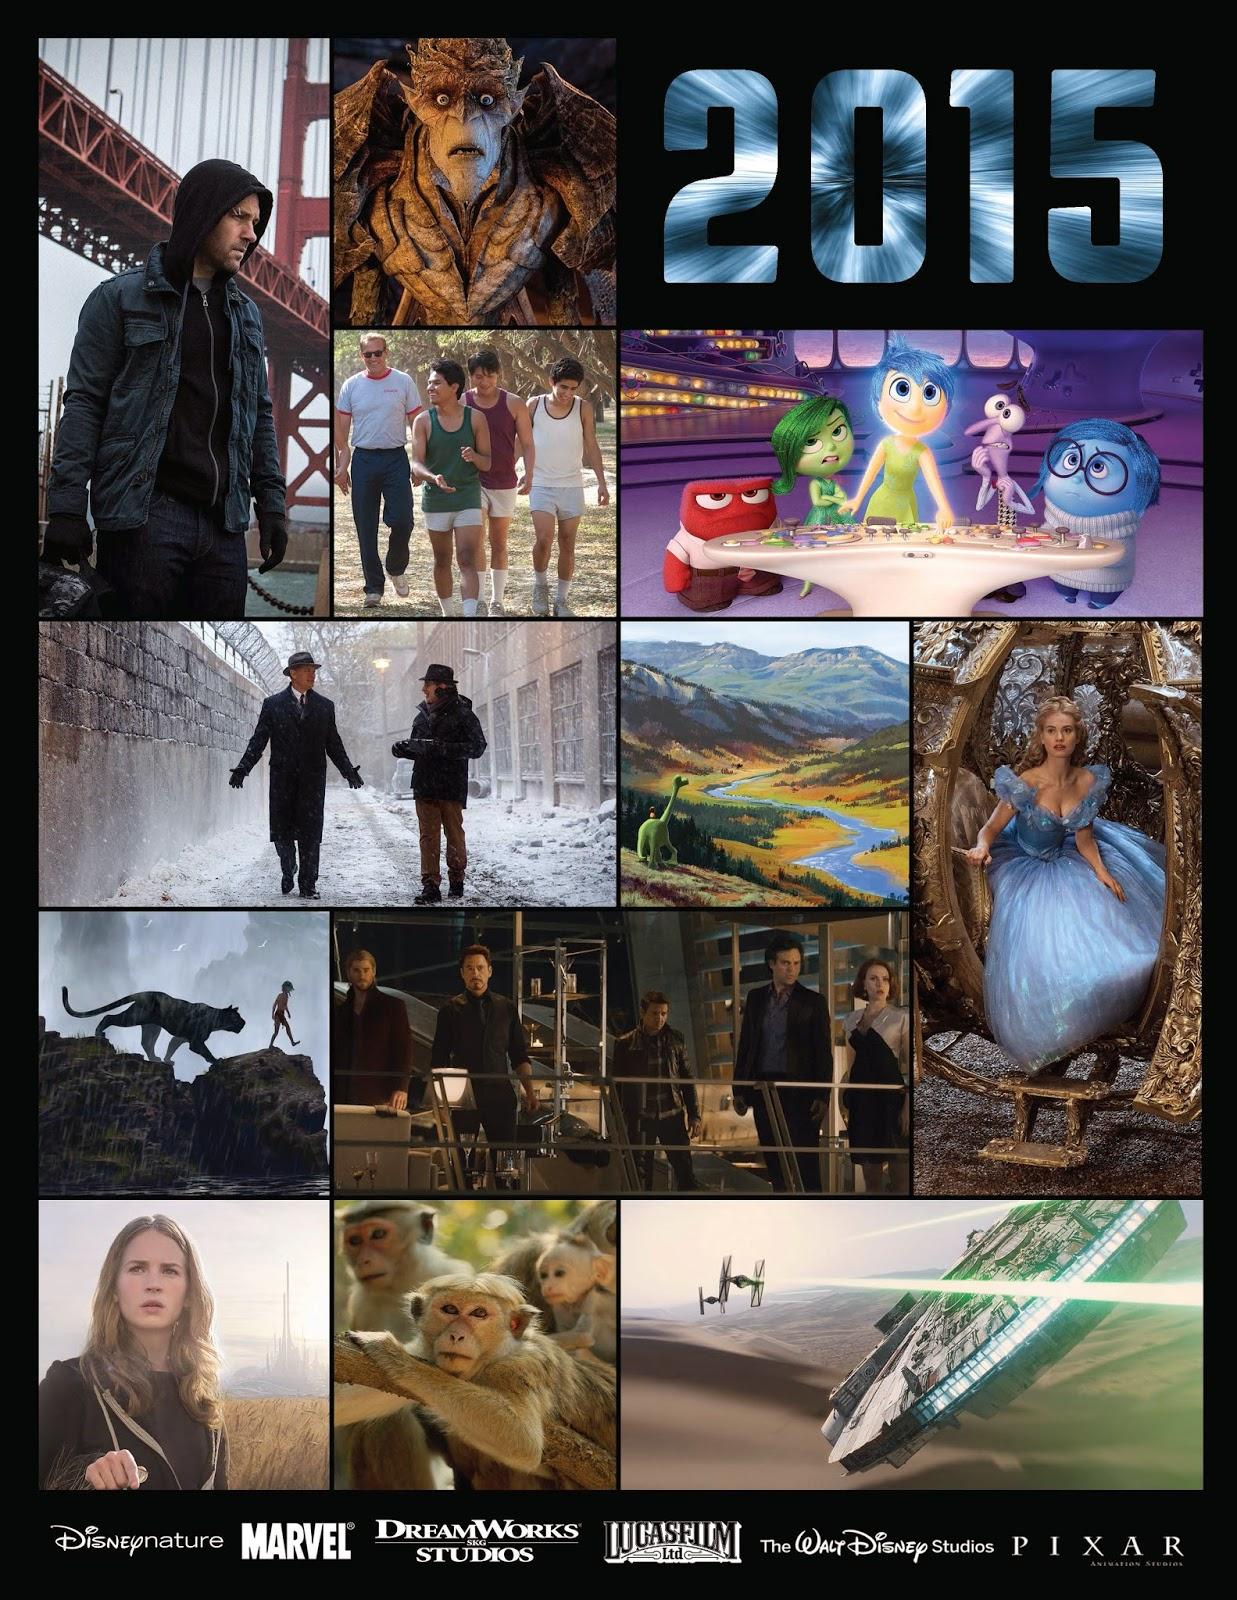 Walt Disney Studios, Pixar, Marvel, DreamWorkks, LucasFilm